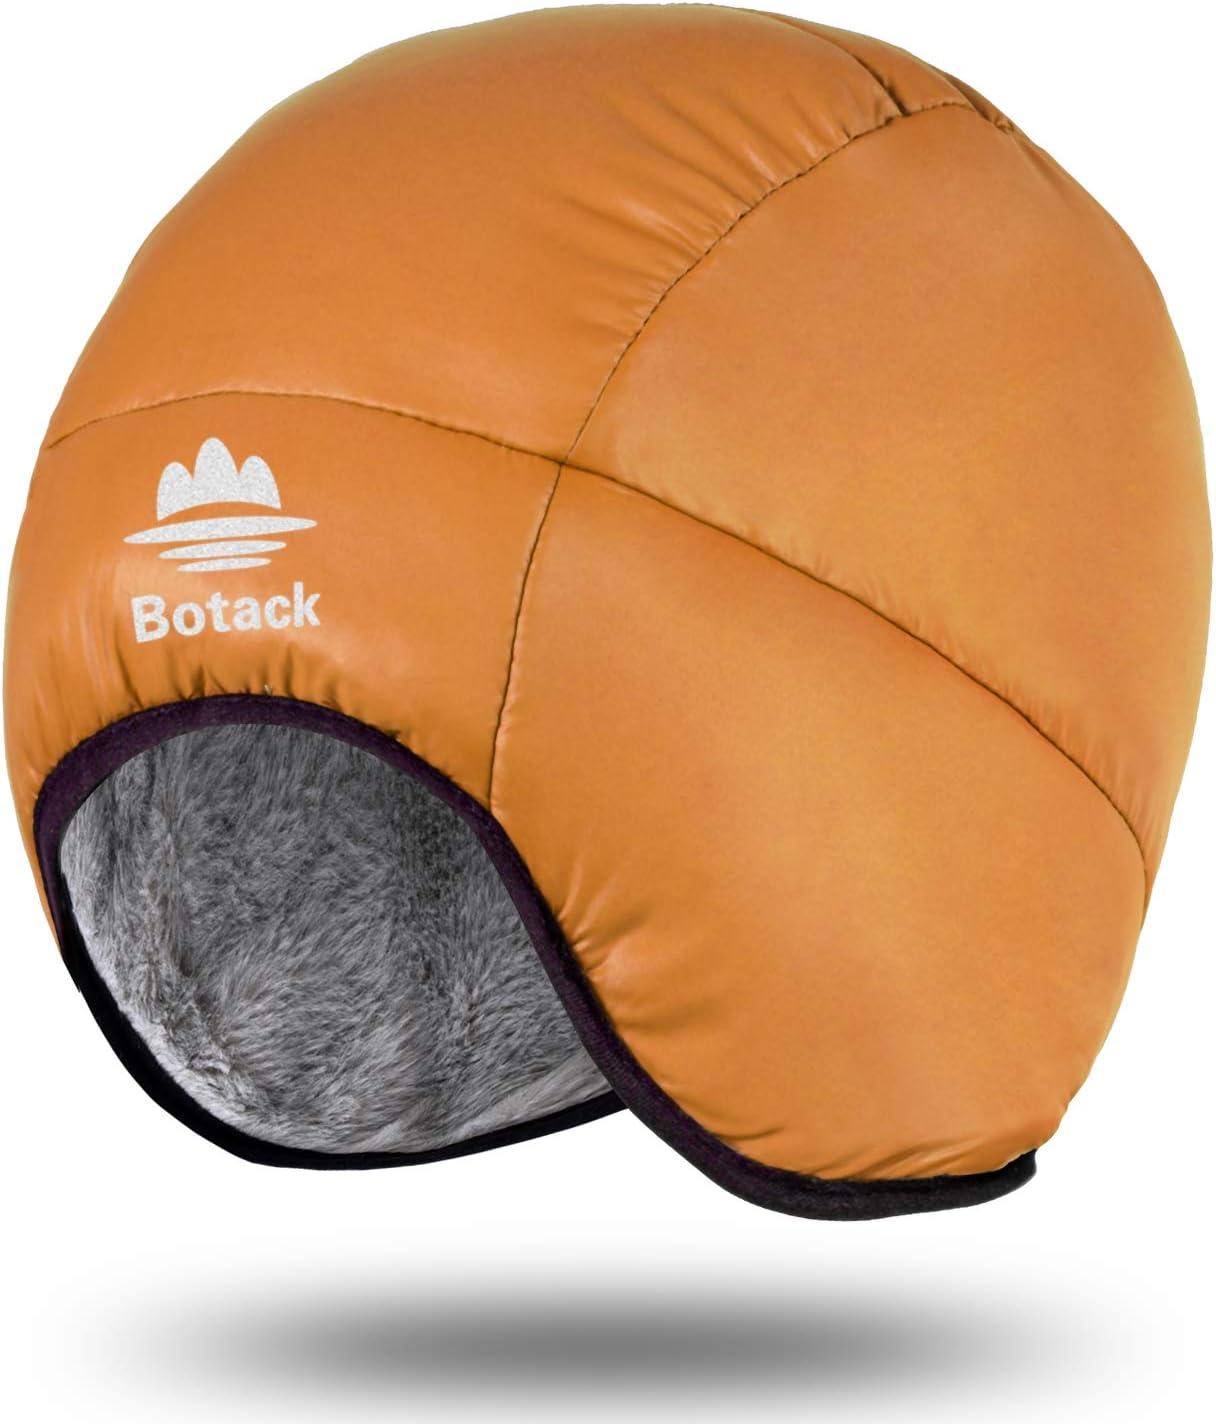 Botack Winter Warm Earflap Down Hat Slouchy Rabbit Fur Cap Windproof Coldproof Beanie Hat for Men Women